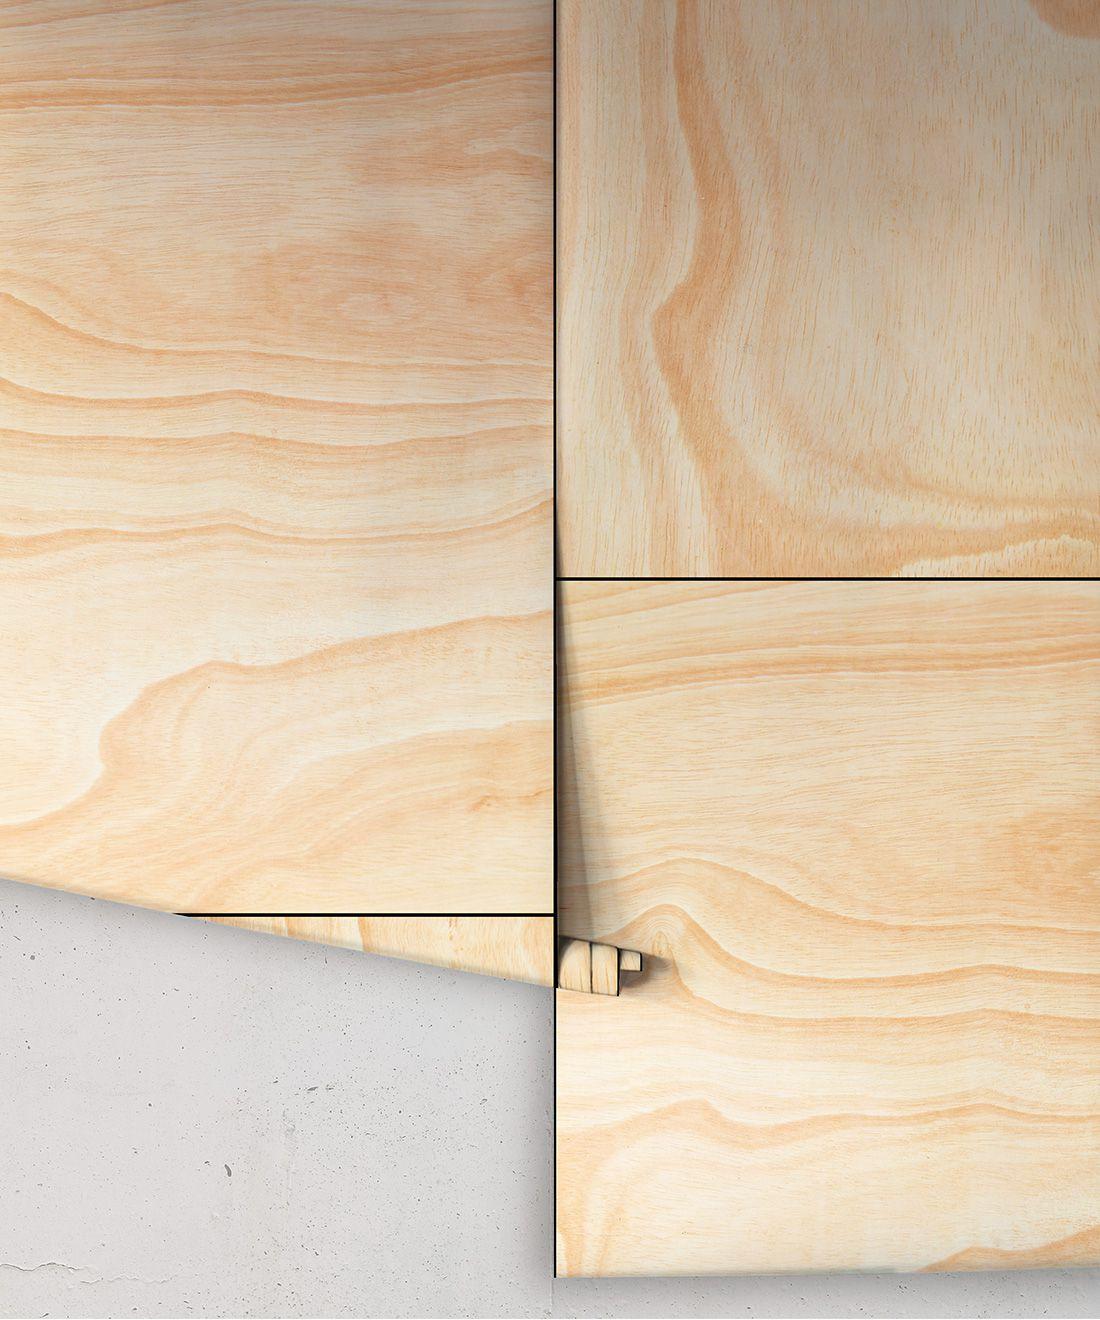 Ply Wood Wallpaper • Light Brown Wallpaper •Wood Grain Wallpaper rolls